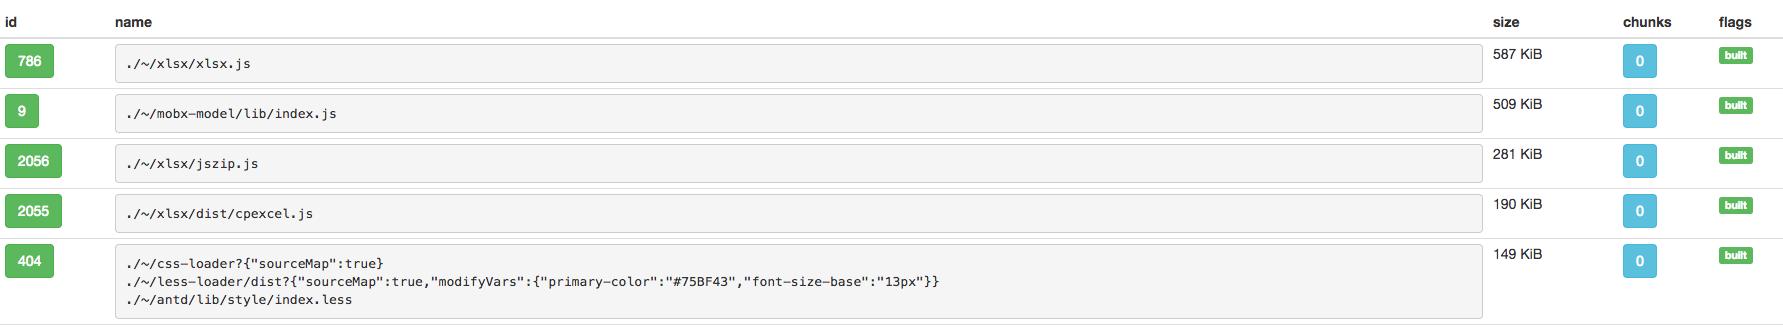 Analyzing Webpack build statistics to reduce bundle size